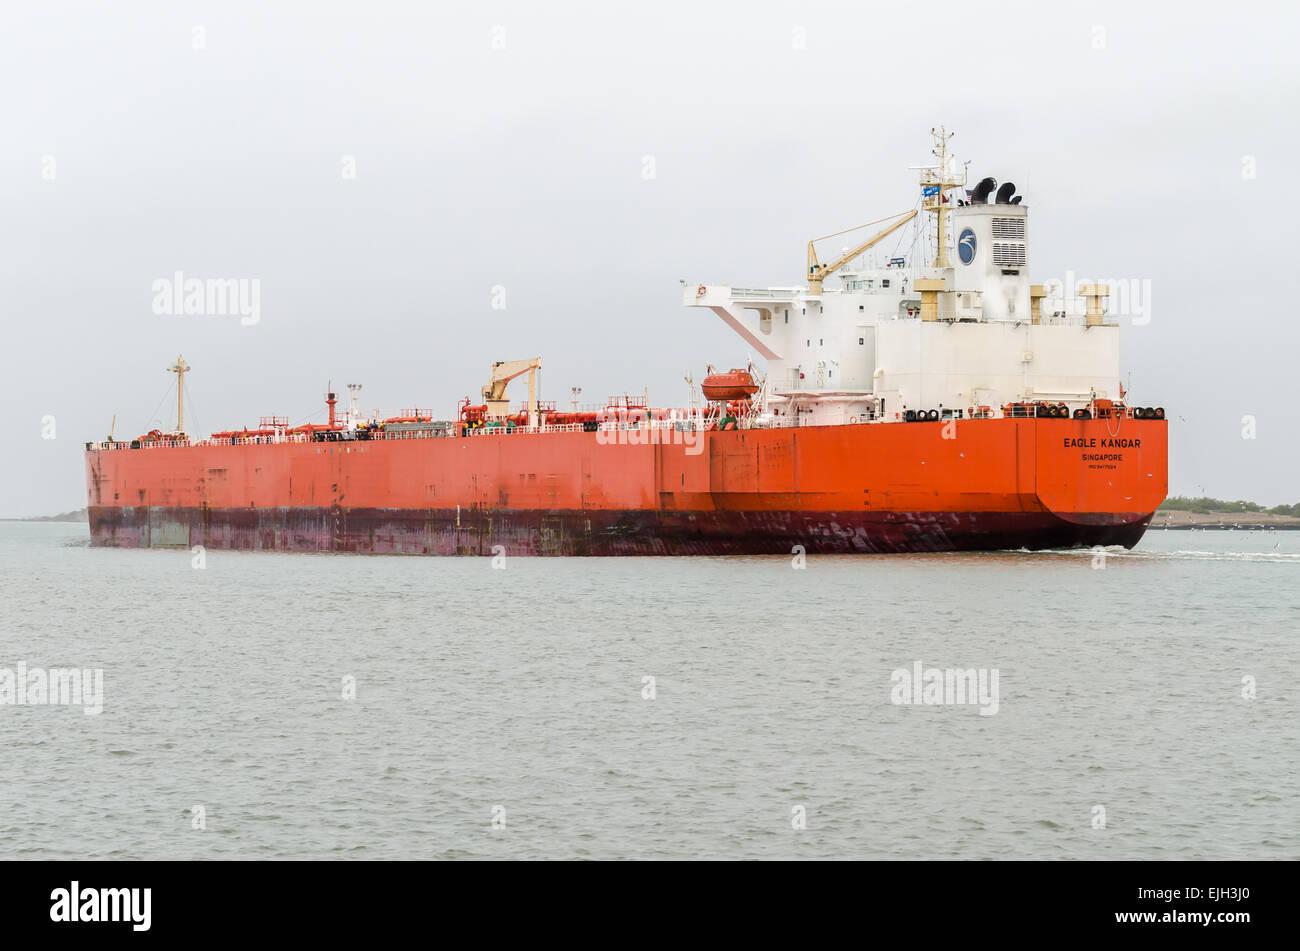 EAGLE KANGAR CRUDE OIL TANKER Gross Tonnage: 60379 Built